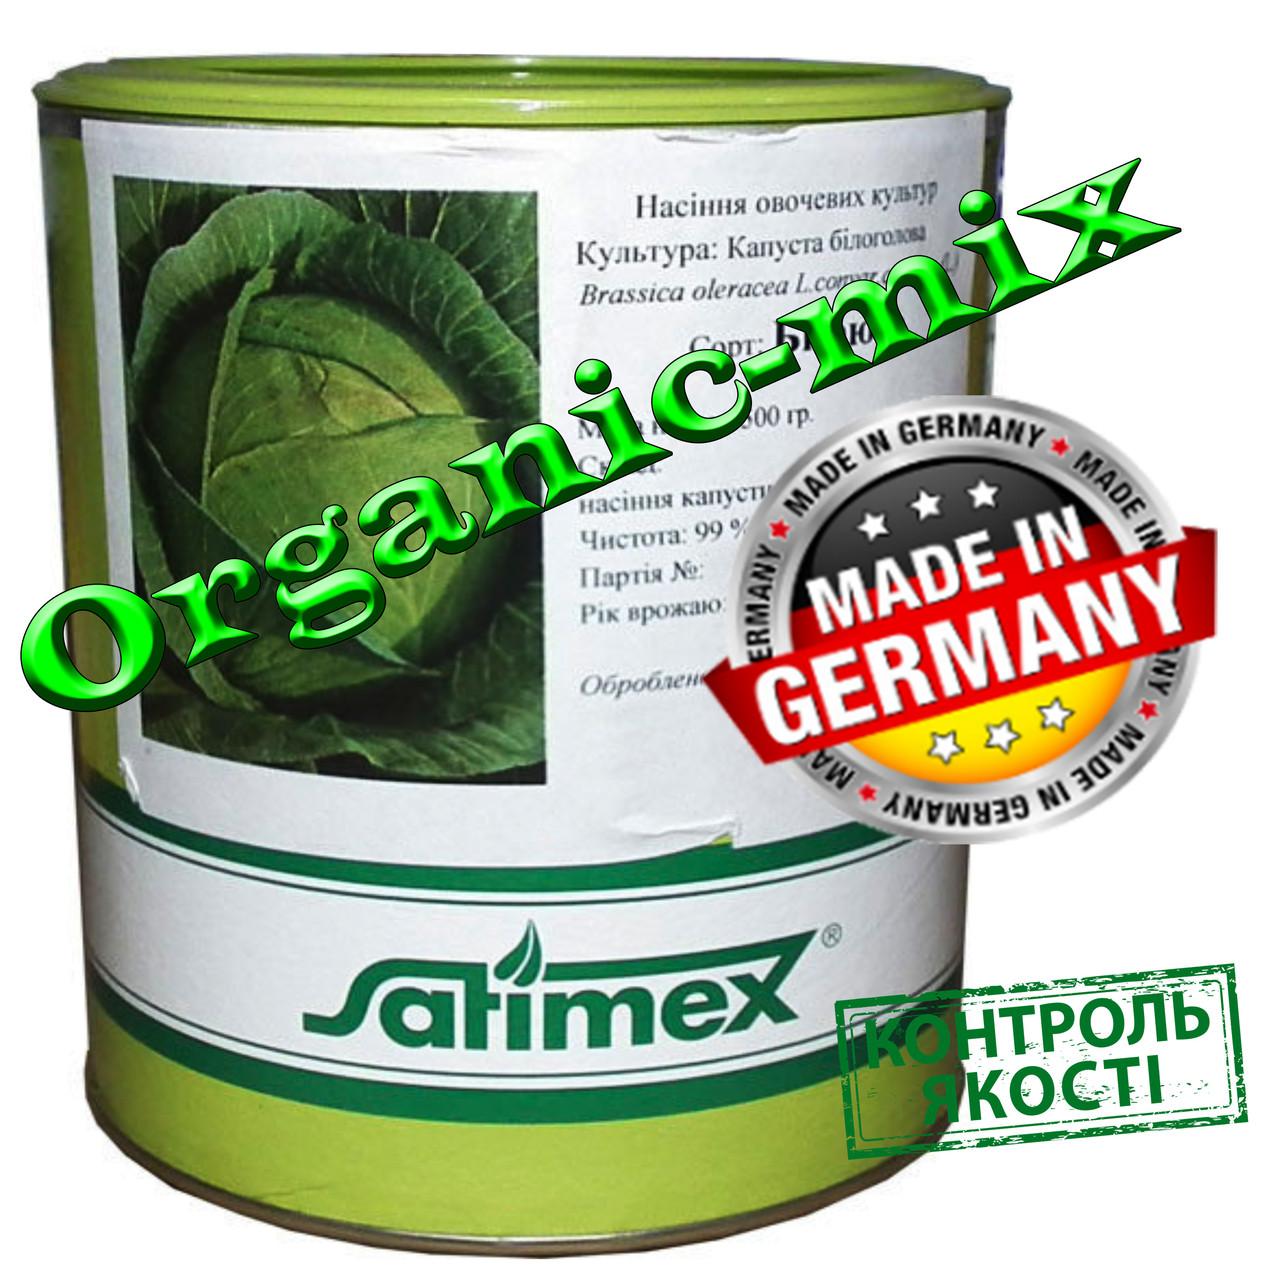 Капуста ранняя КОПЕНГАГЕН МАРКЕТ от ТМ SATIMEX (Германия) , банка 500 грамм